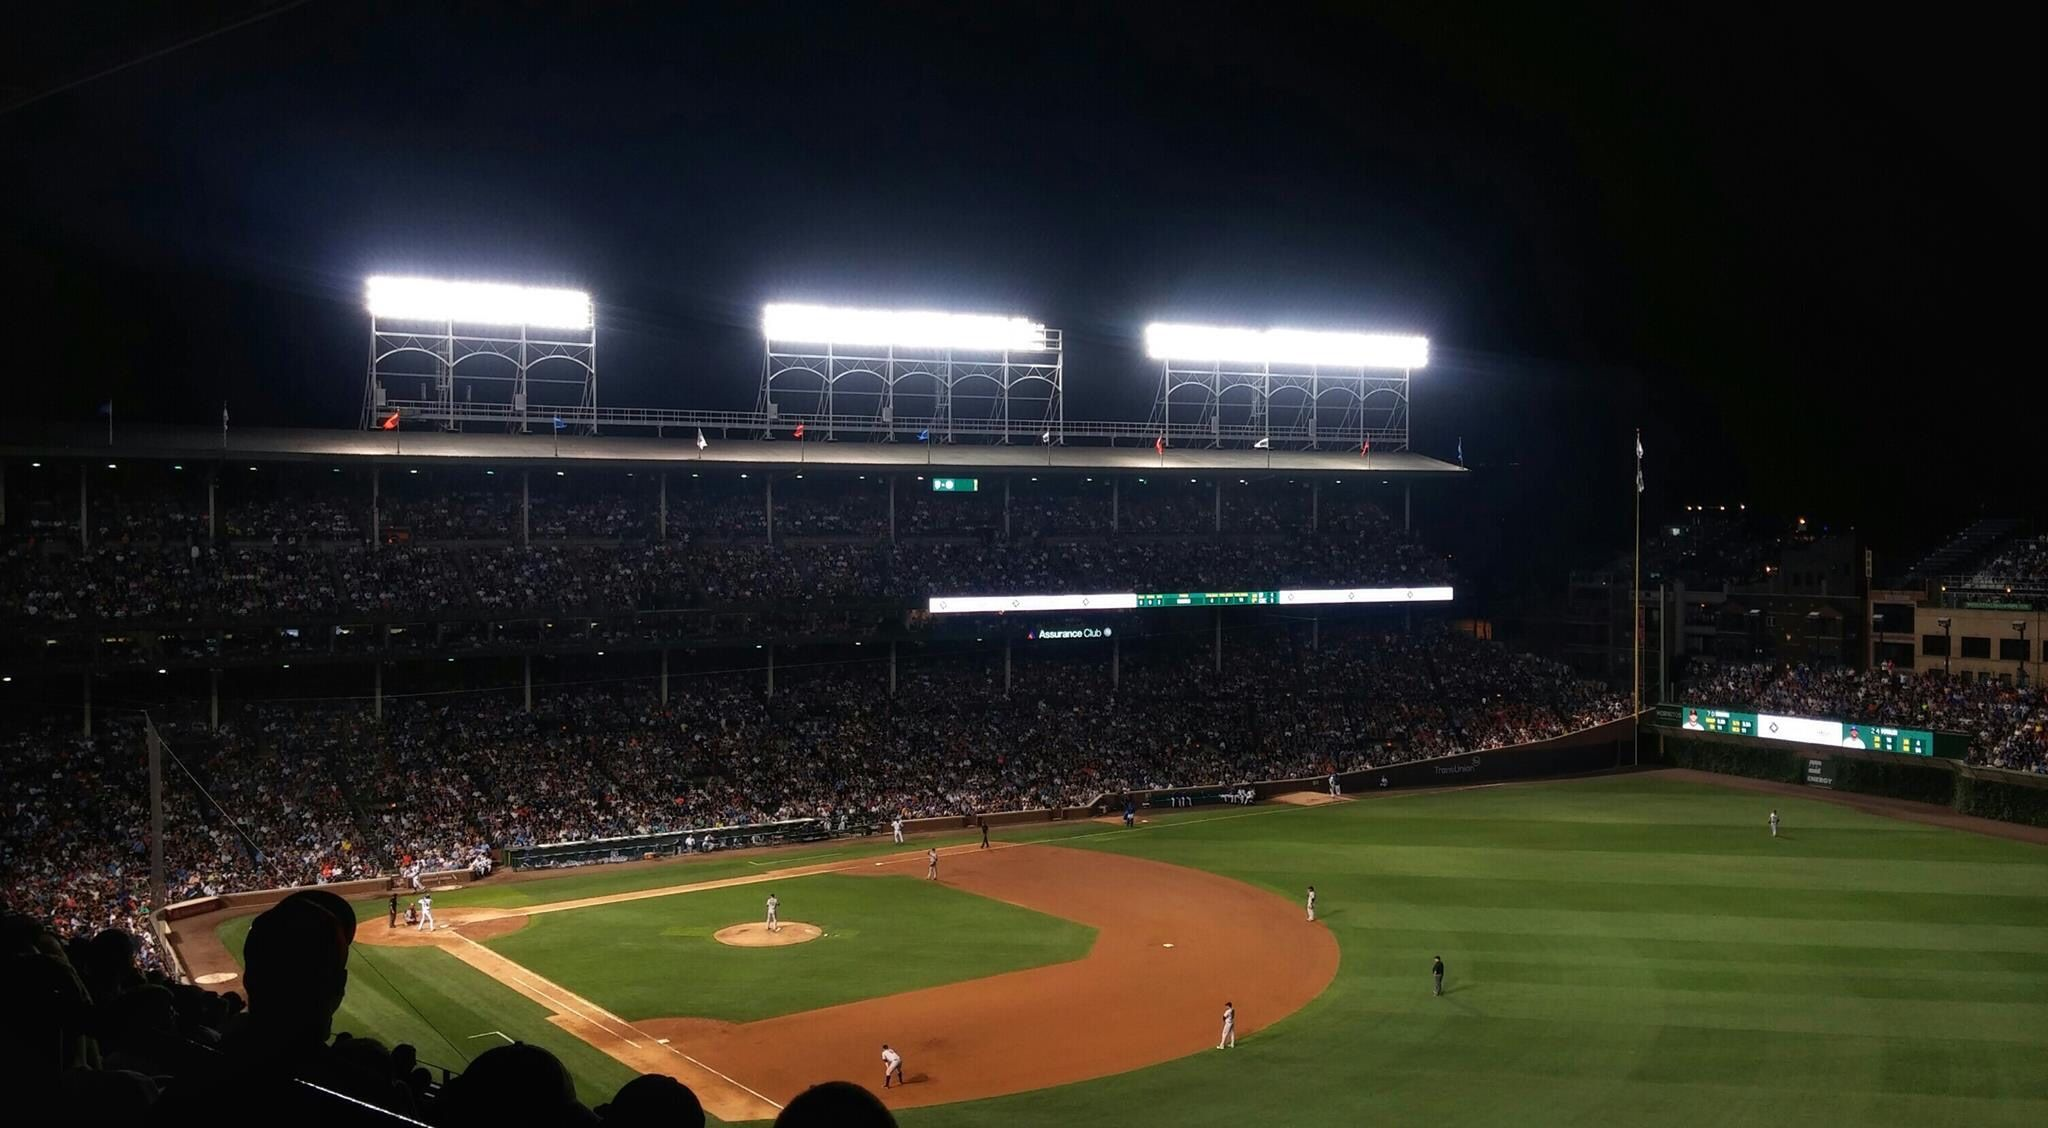 Wrigley Field at night Wrigley field, Cubs world series